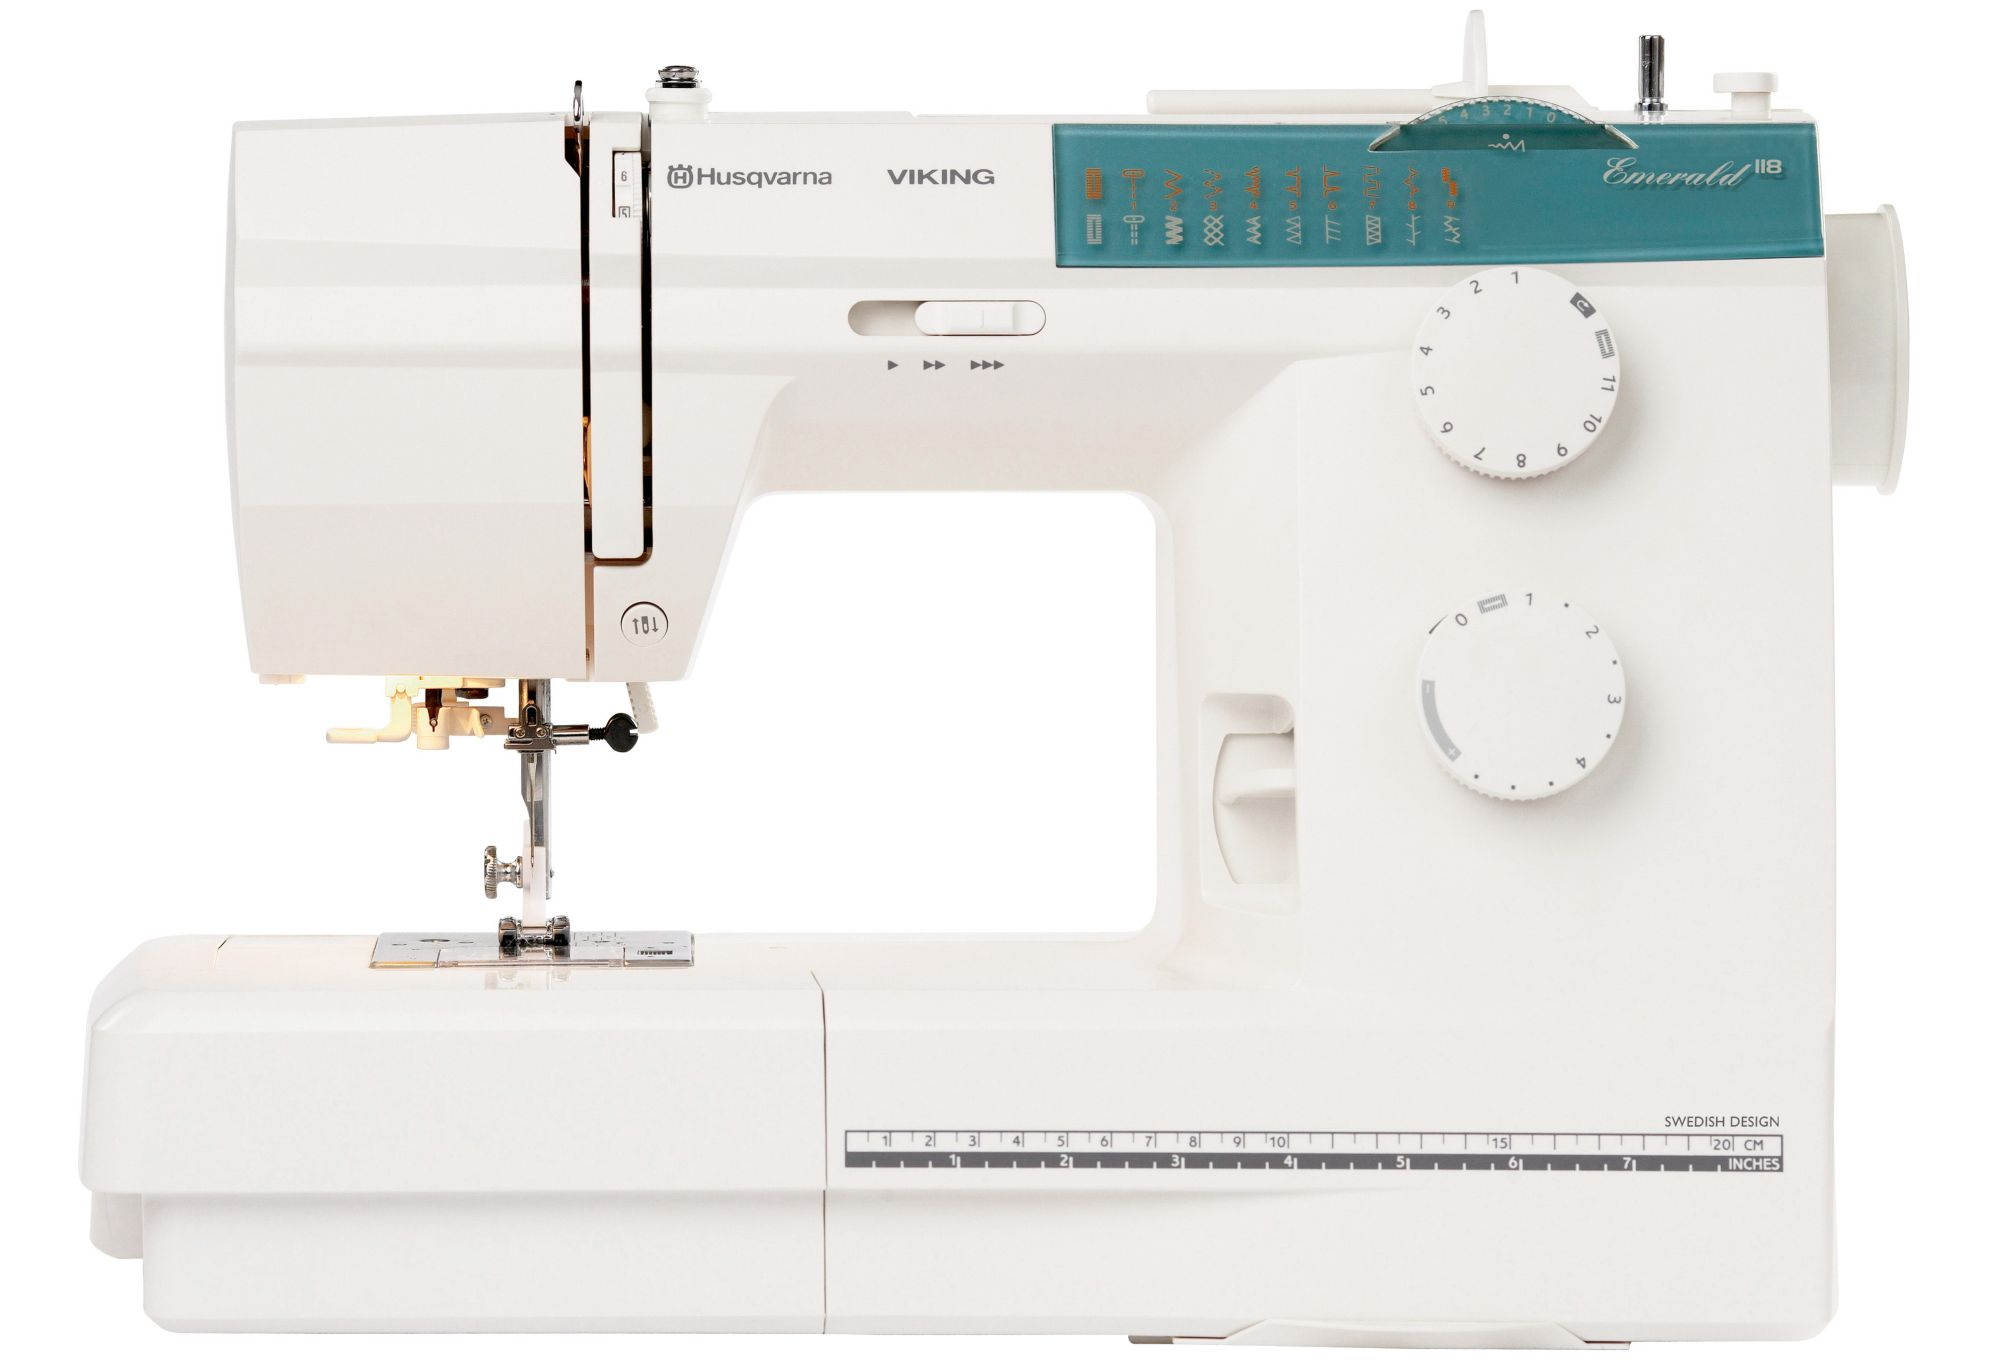 HUSQVARNA VIKING Husqvarna Viking Nähmaschine Emerald 118, 18 Nähprogramme, integrierter Nadeleinfädler